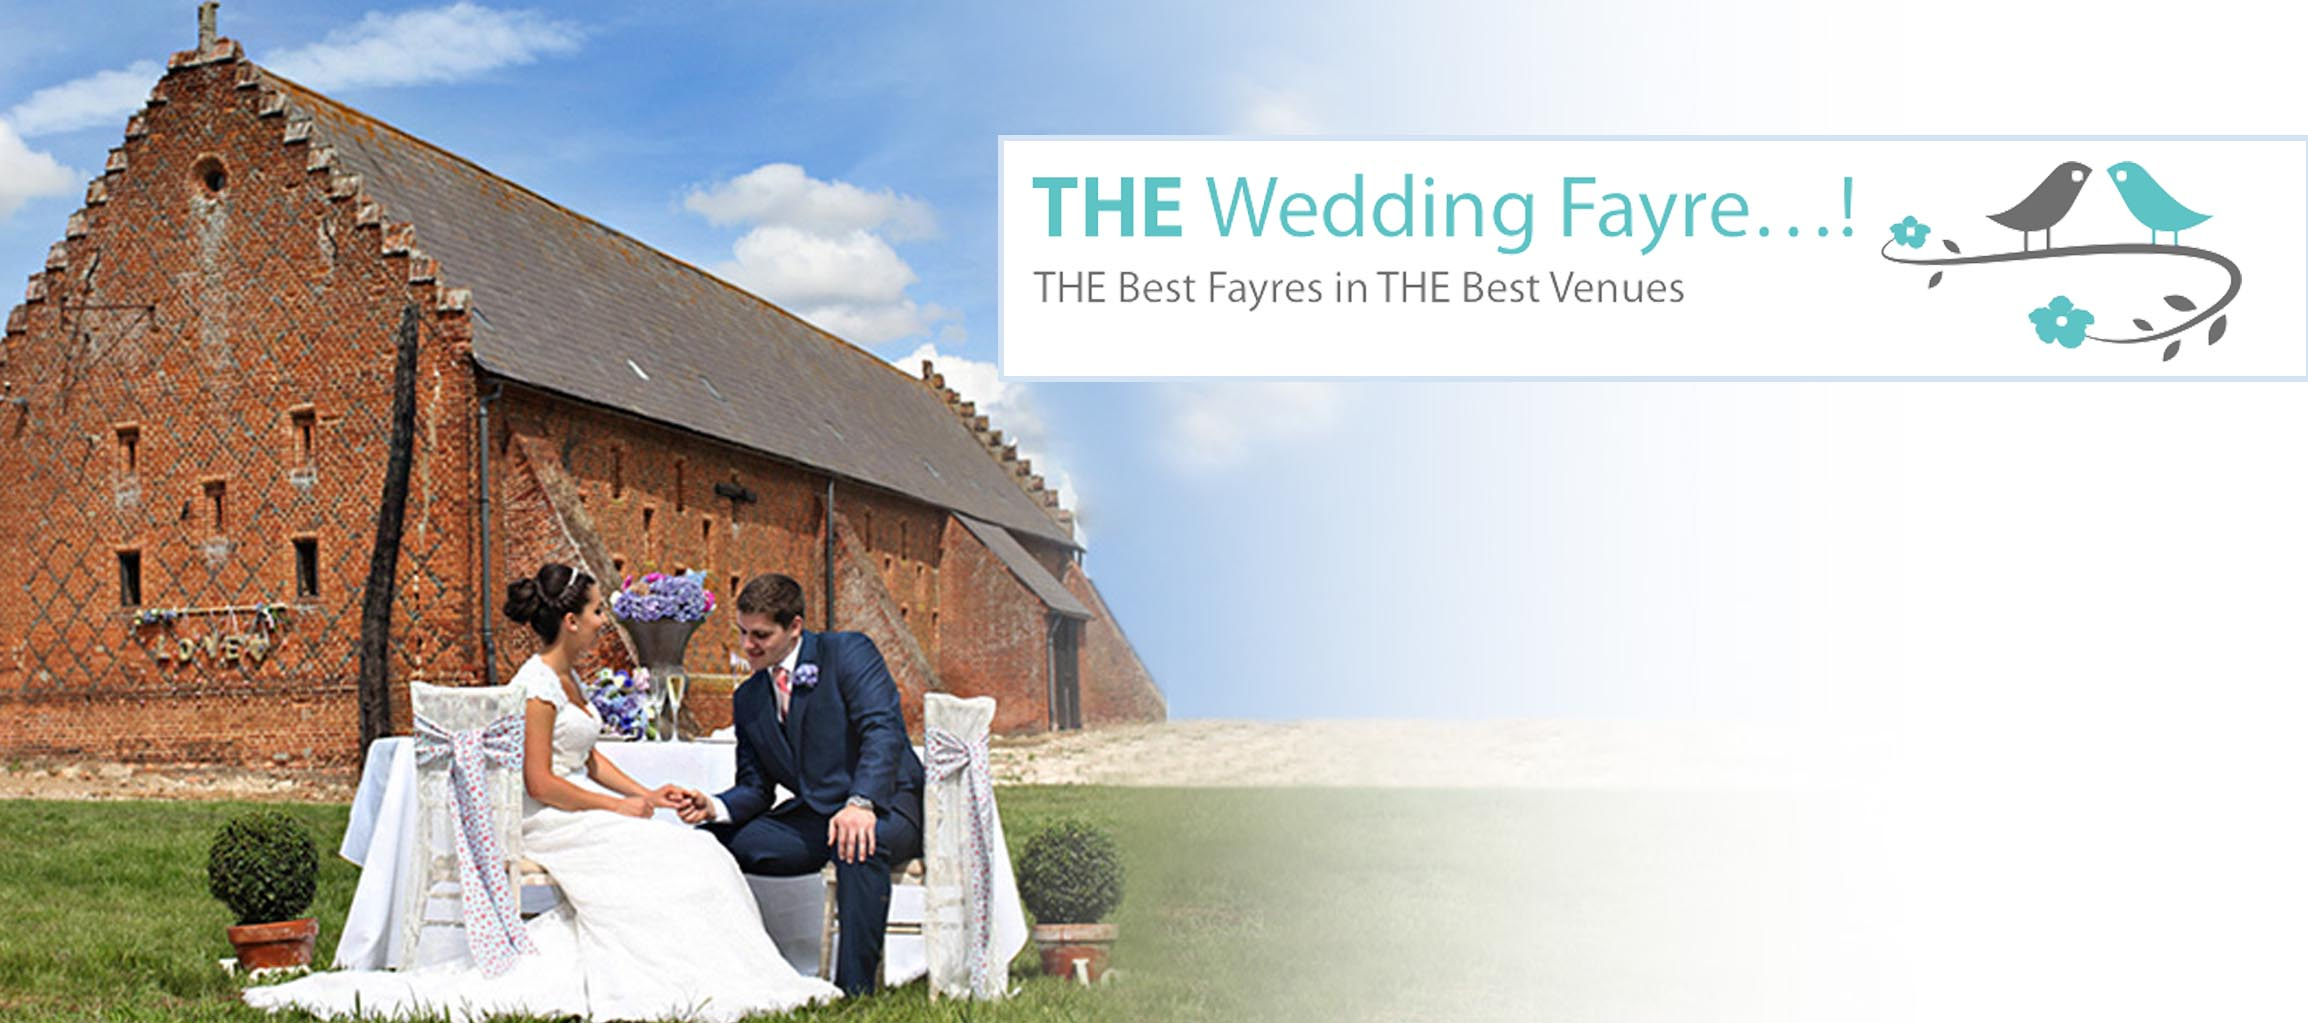 the wedding Fayre...! - 29th April '18 - Copdock Hall, Copdock.11.00am - 3.30pm